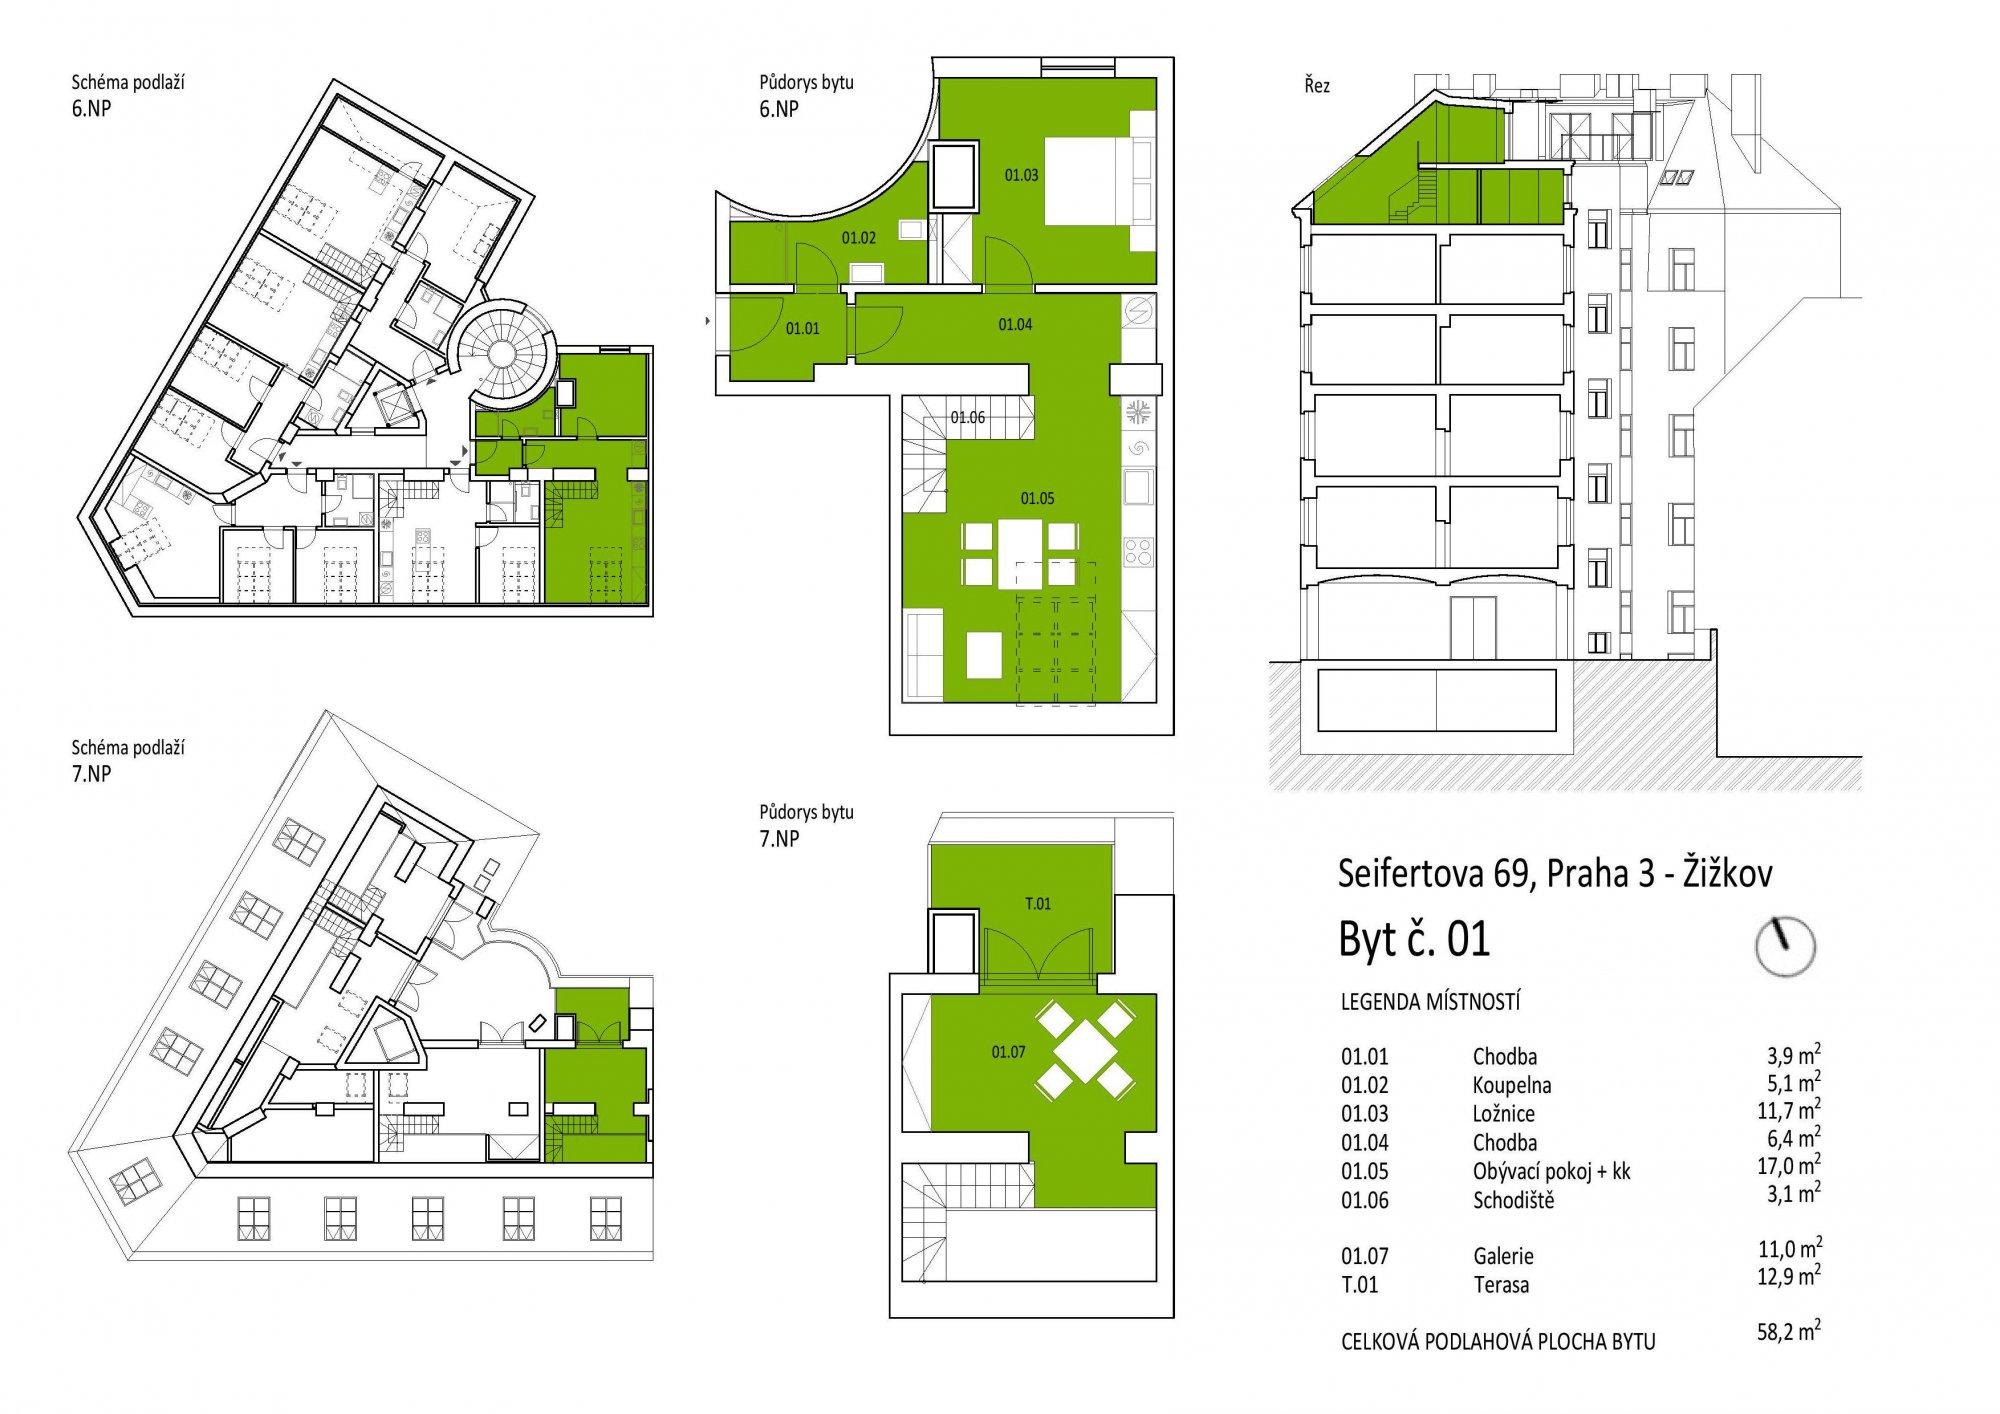 Půdorys - Půdní byt 2+kk, plocha 71 m², ulice Seifertova, Praha 3 - Žižkov